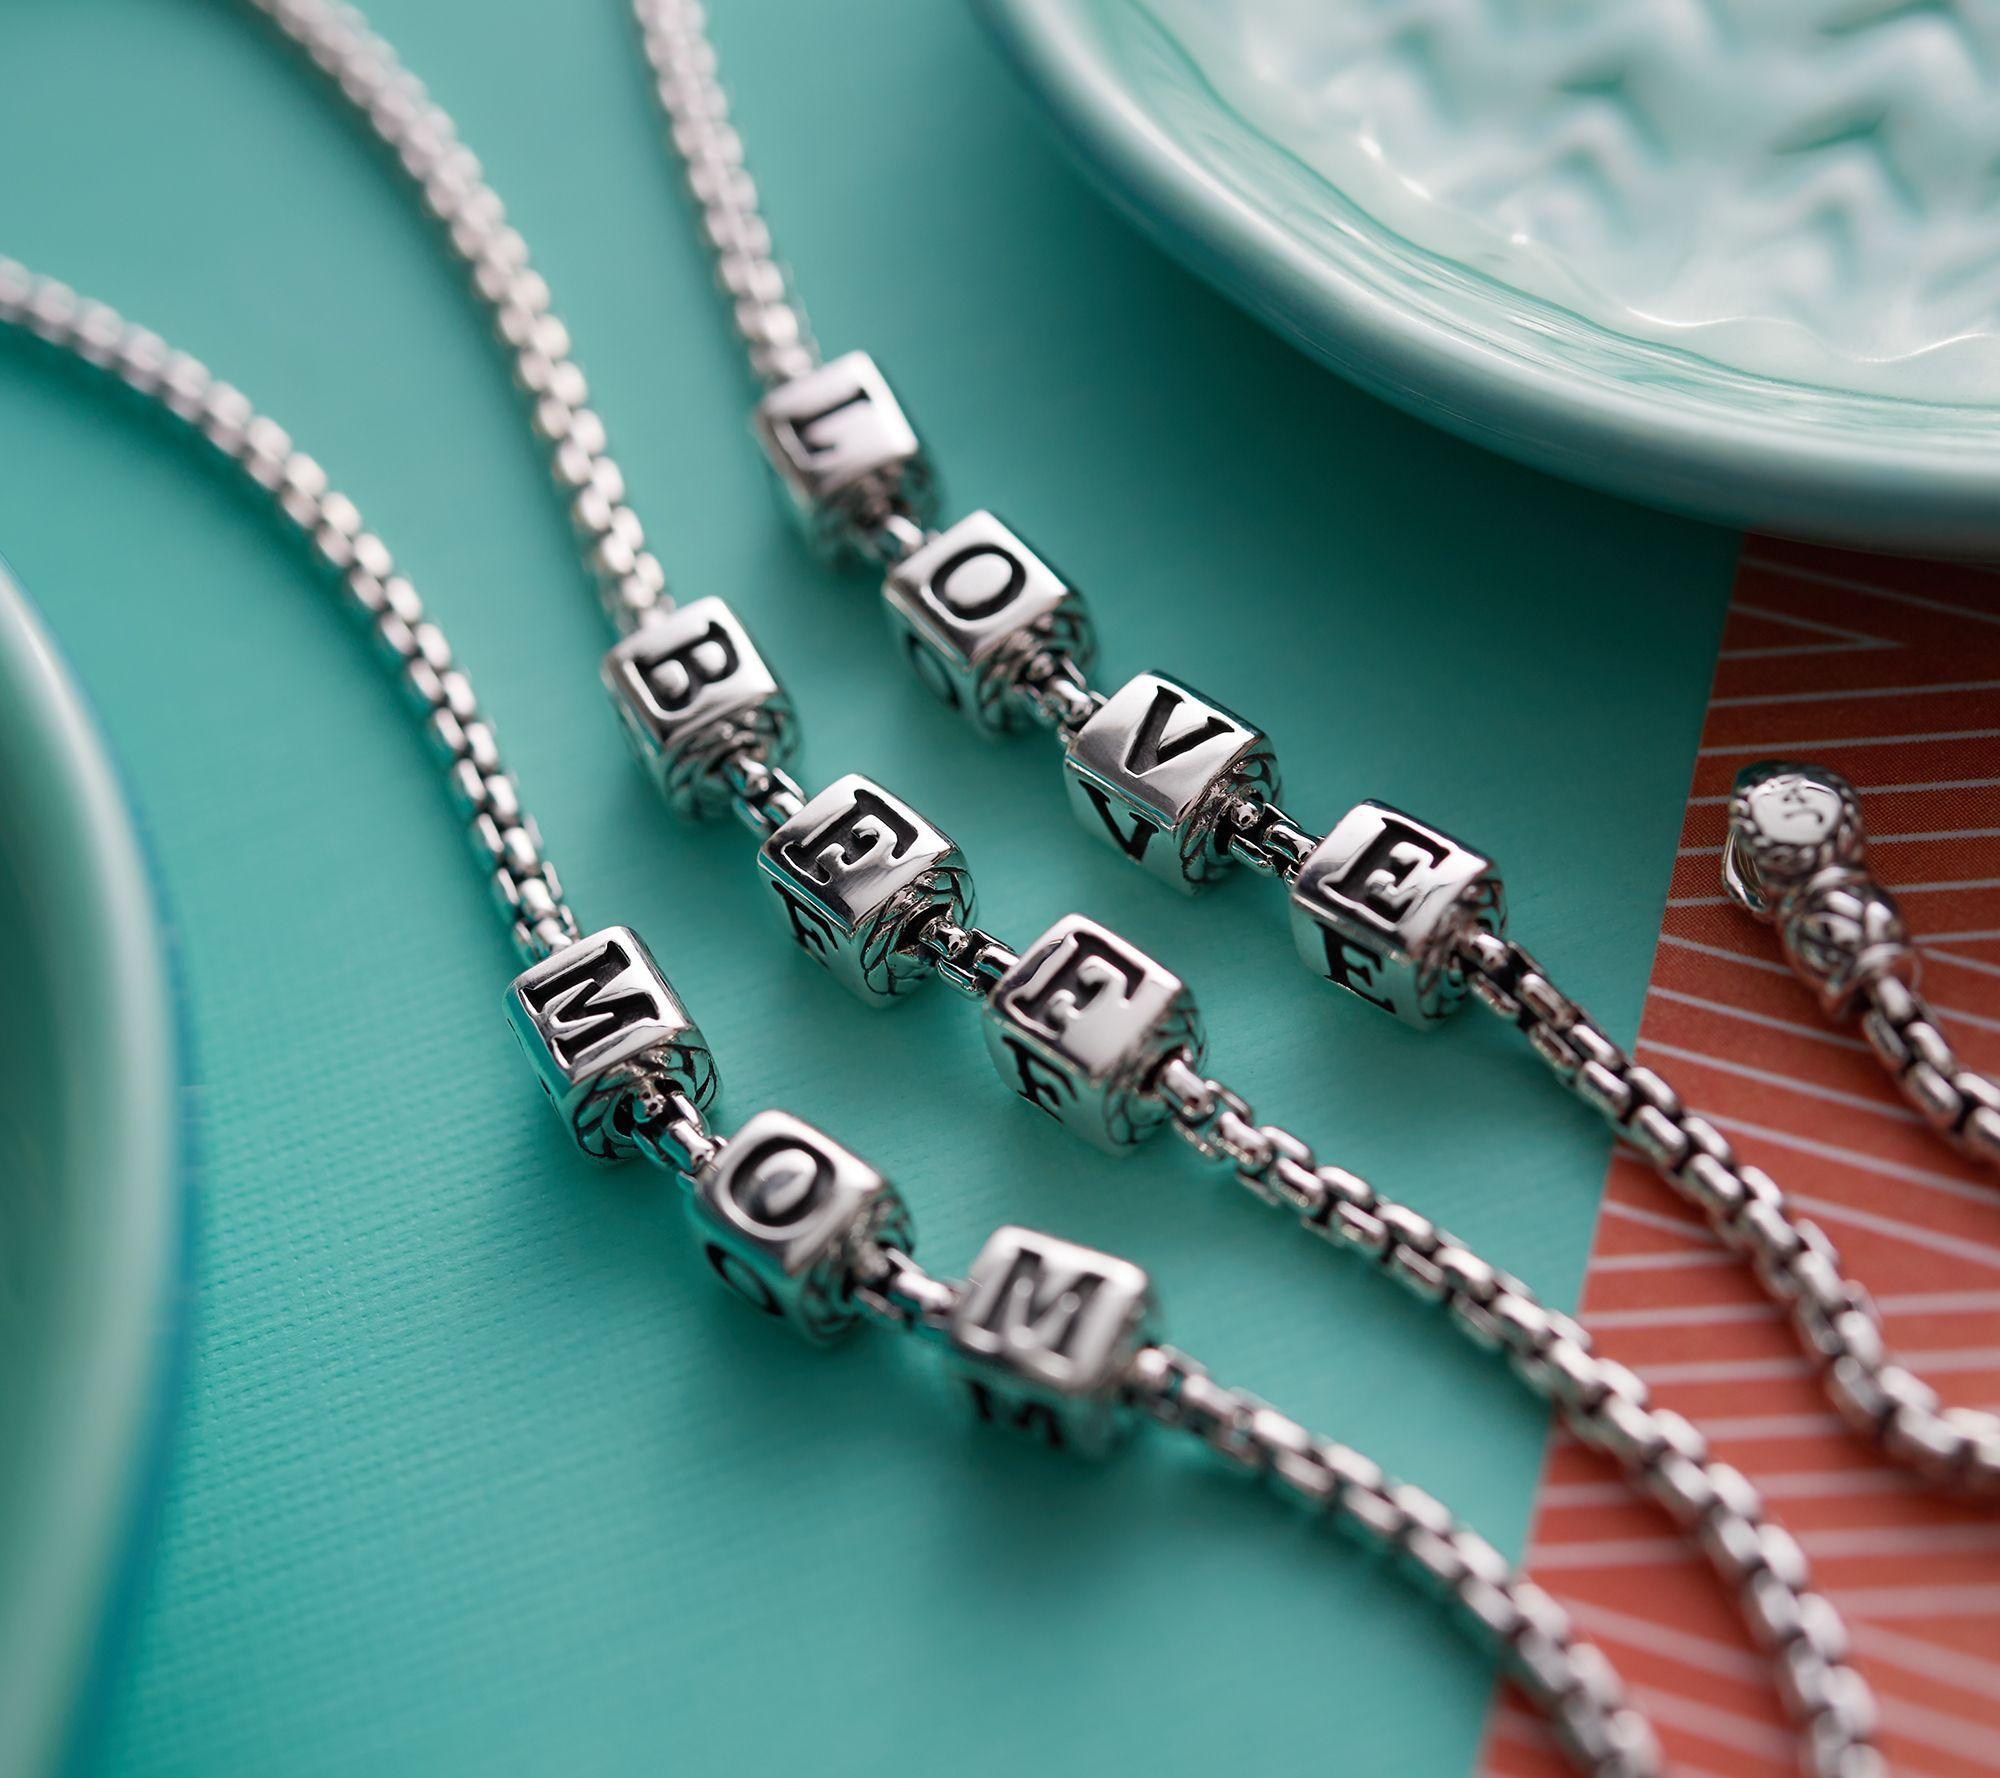 908a9b2c22 JAI Sterling Silver Choice of Message Box Chain Bracelet, 10.0g - Page 1 —  QVC.com